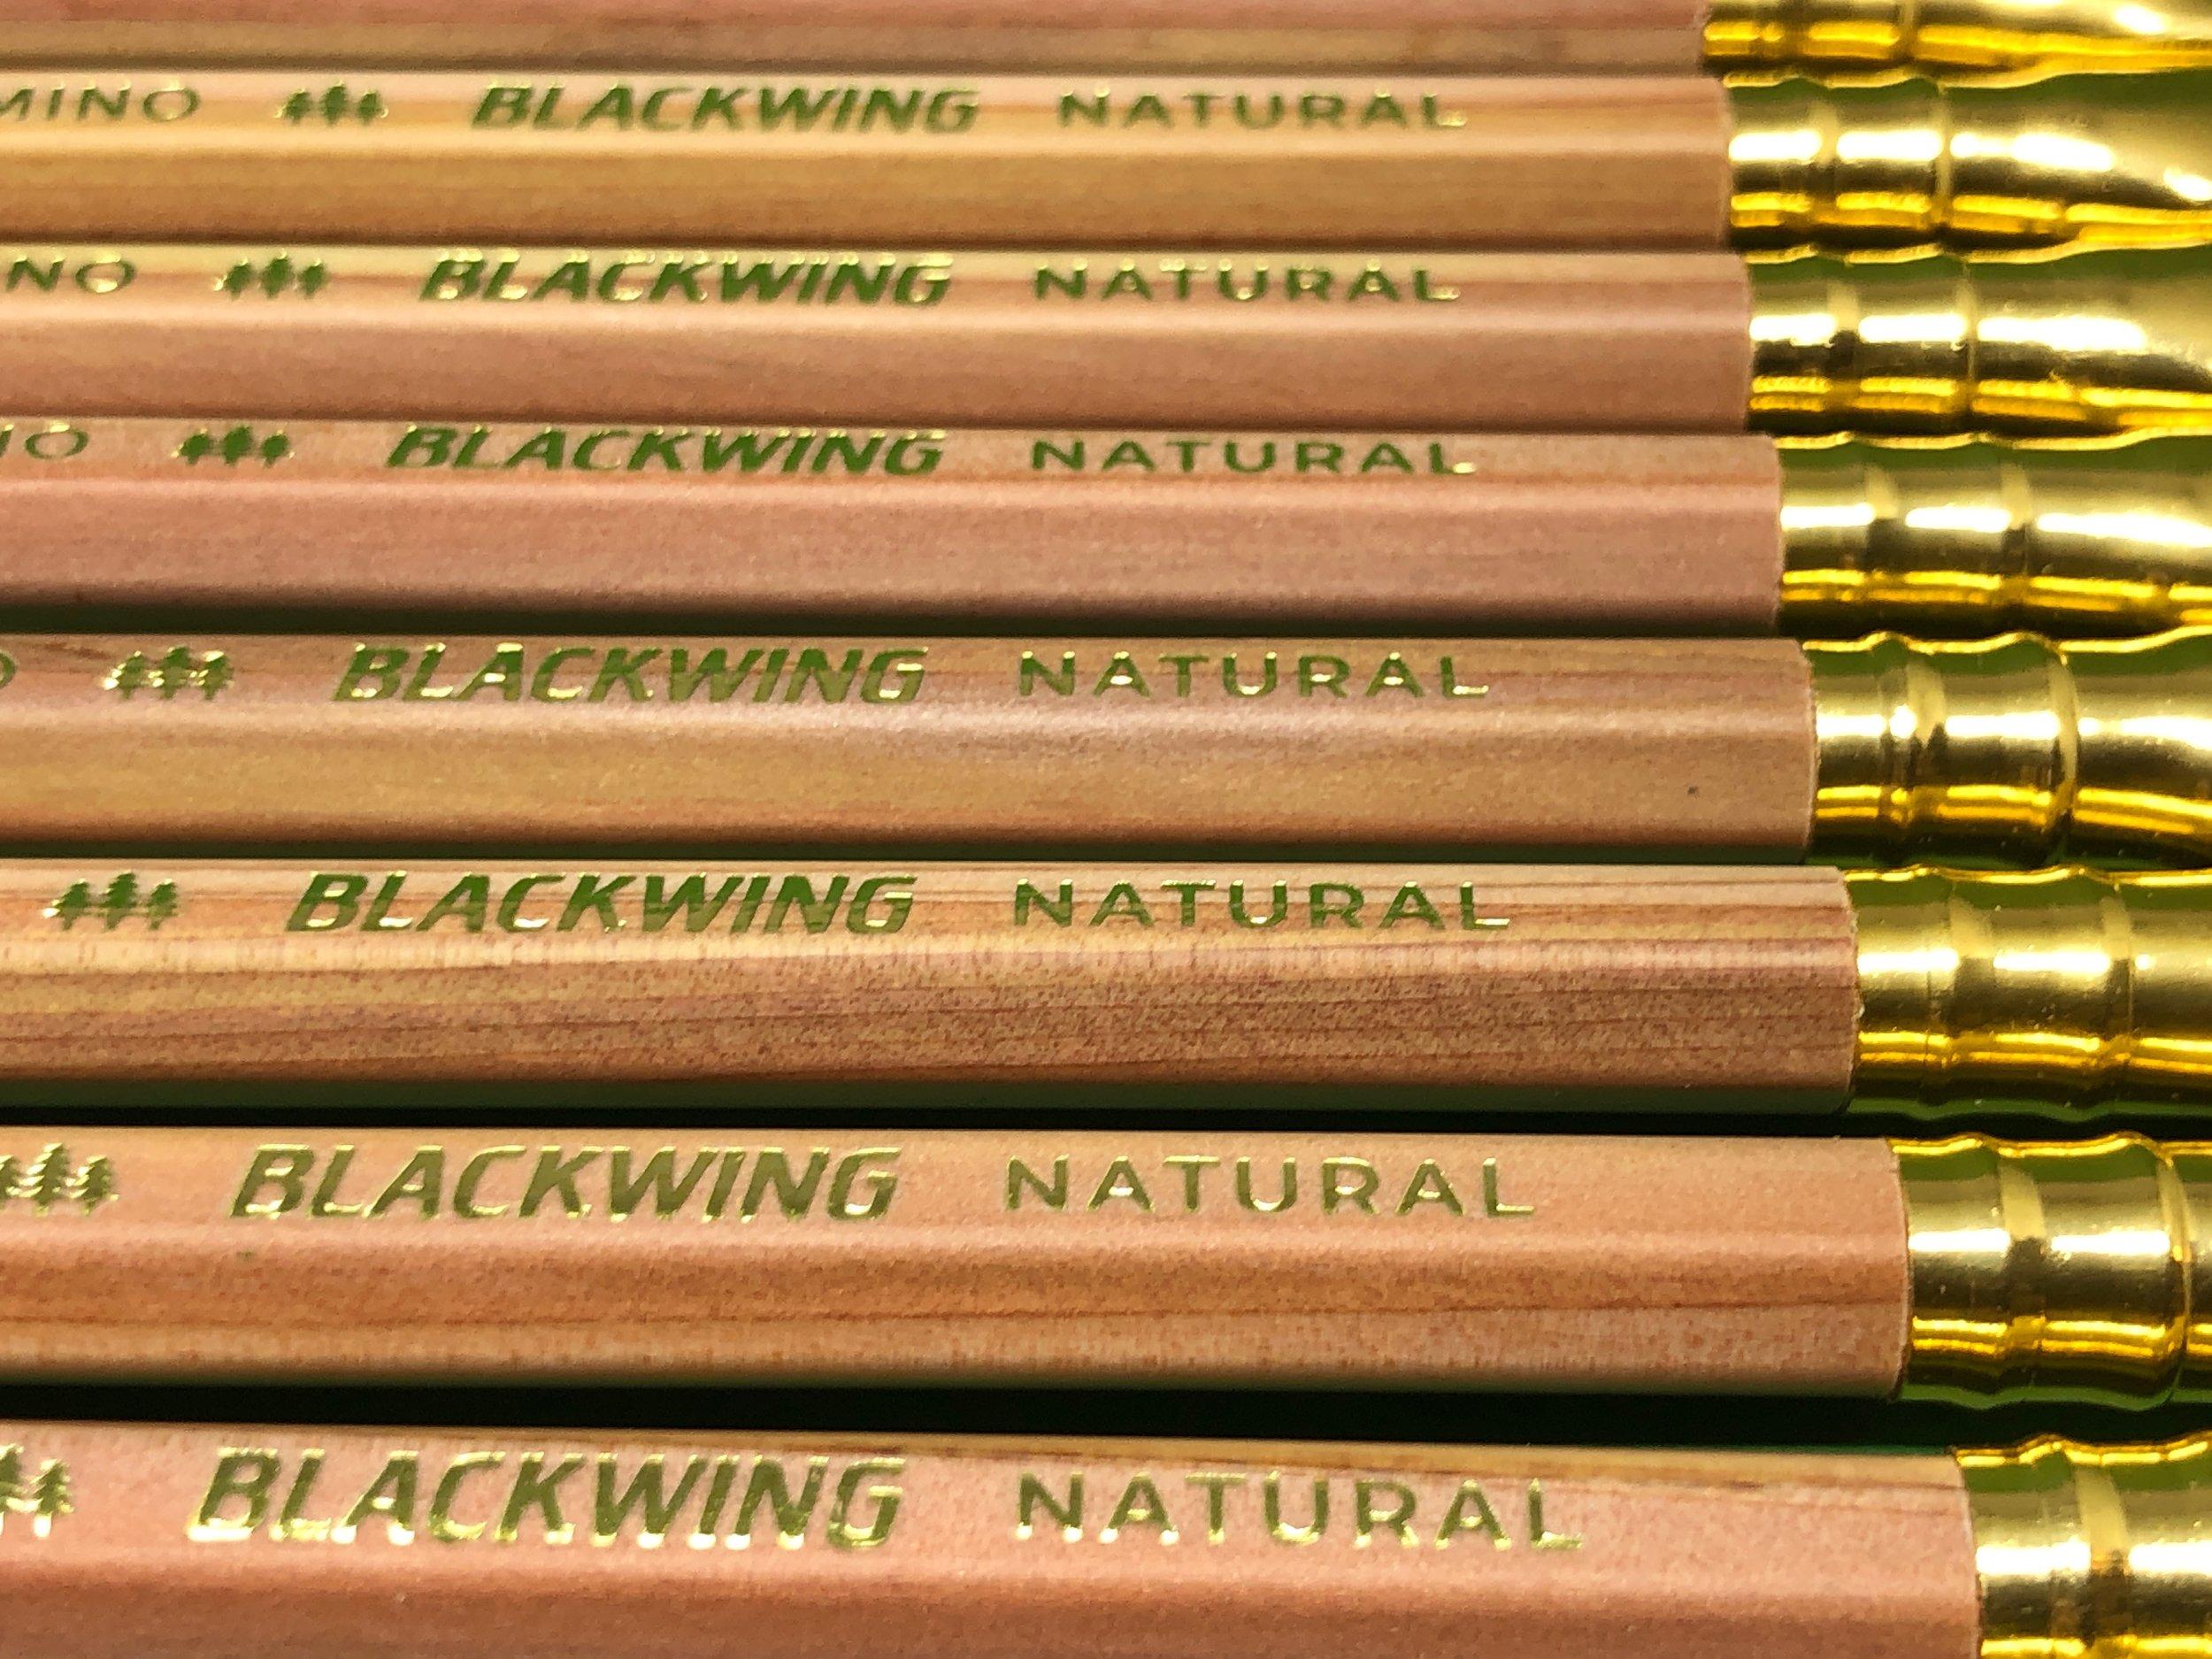 blackwing-natural-2.jpg